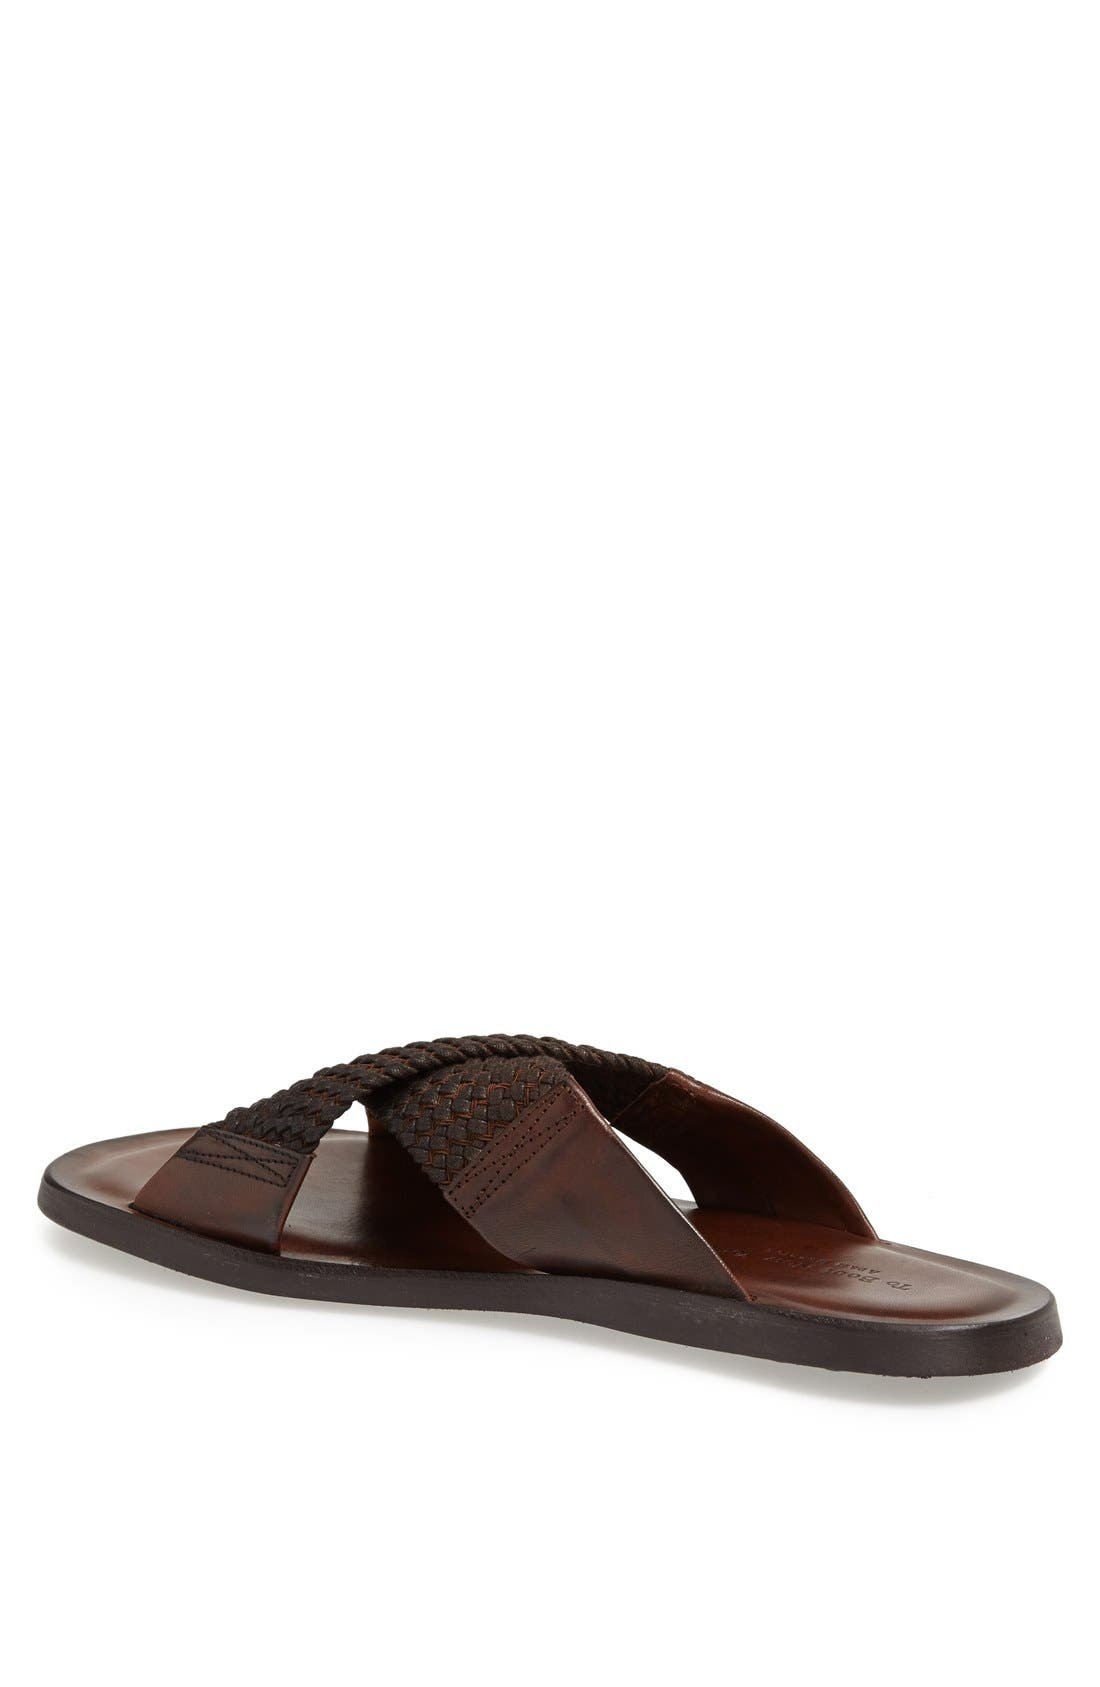 Alternate Image 2  - To Boot New York 'Ibiza' Leather Slide Sandal